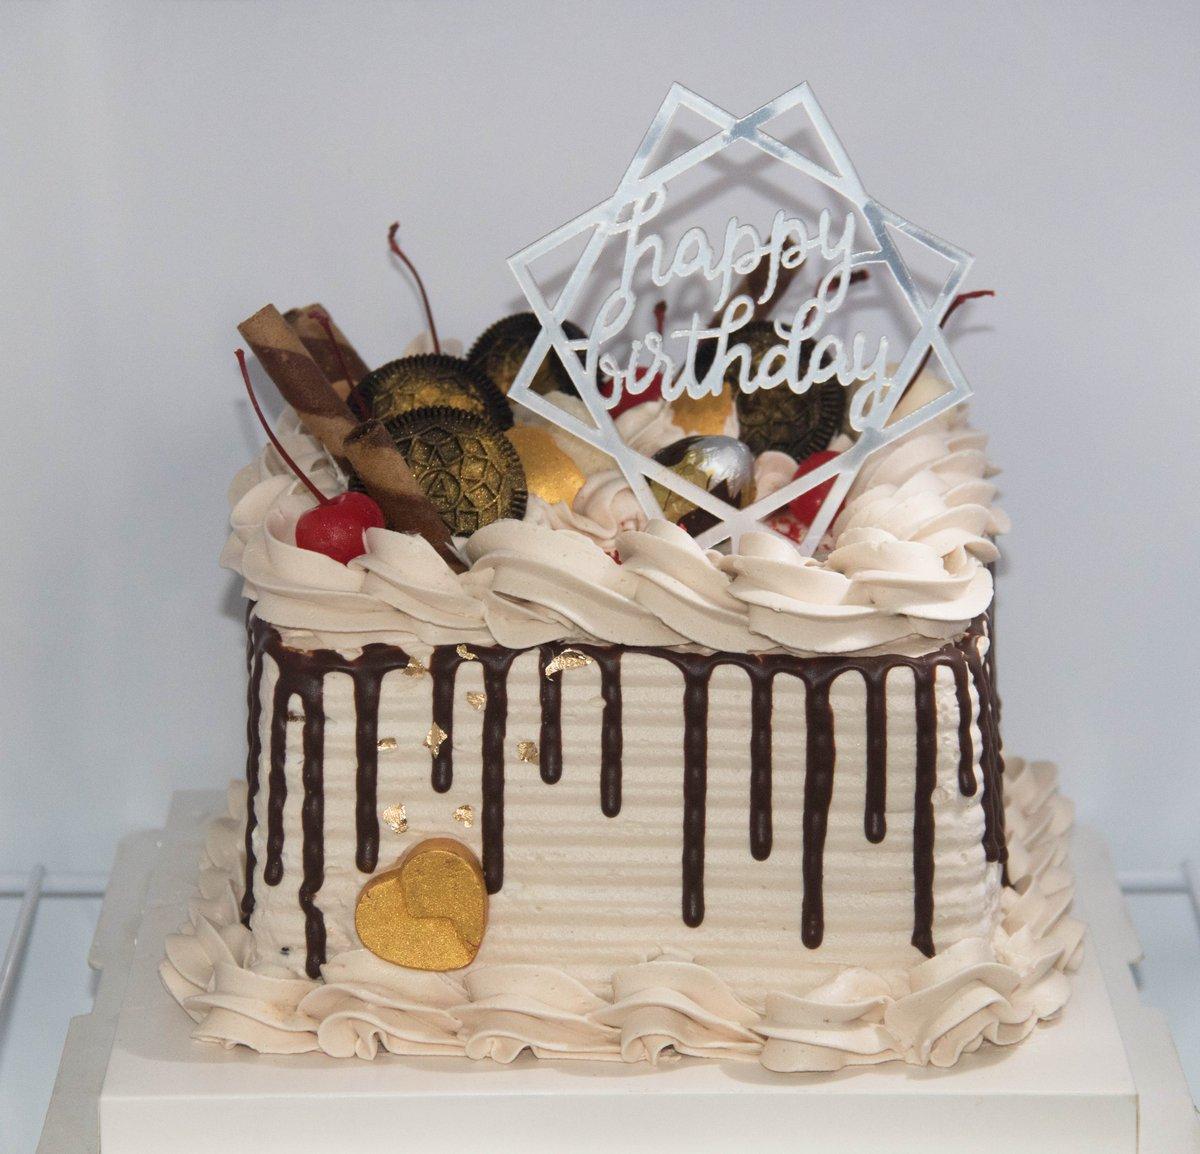 @klassic_bites  #tasty ...feel the taste in every bite! #klassicbites😋 for orders or enquiries #Call or #WhatsApp 0555077589 #klassic  #trending #popular #cupcake #bakery #cakeghana #ghana🇬🇭 #cakes #pastrychef #pastrylove #pastrylife #yummy #bakery #foodie #food #cakesinho #tgif https://t.co/iW0TPwmTuZ